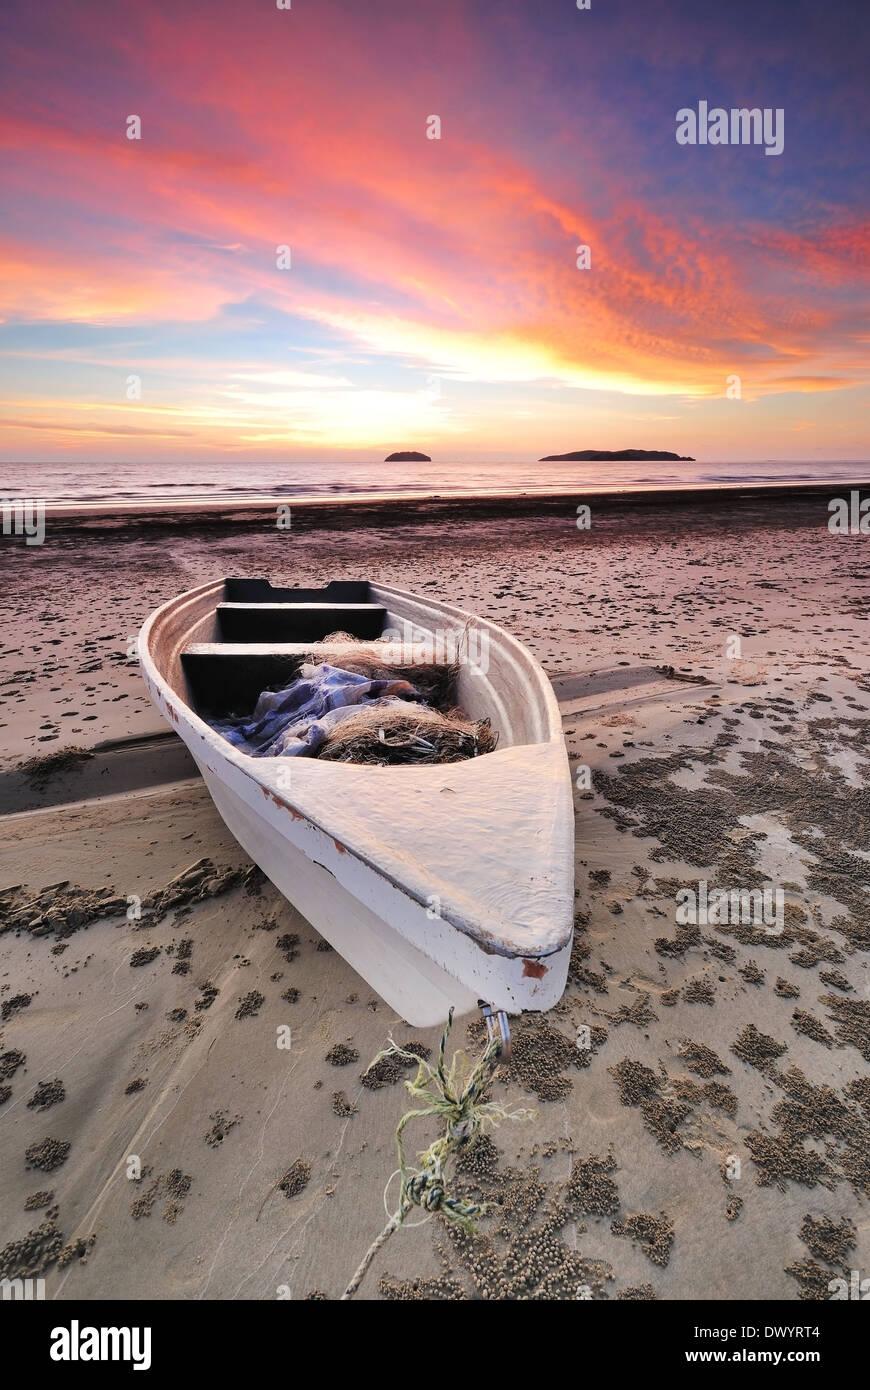 Boat and beach sunset in Tanjung Aru beach, kota kinabalu, sabah, borneo, malaysia - Stock Image